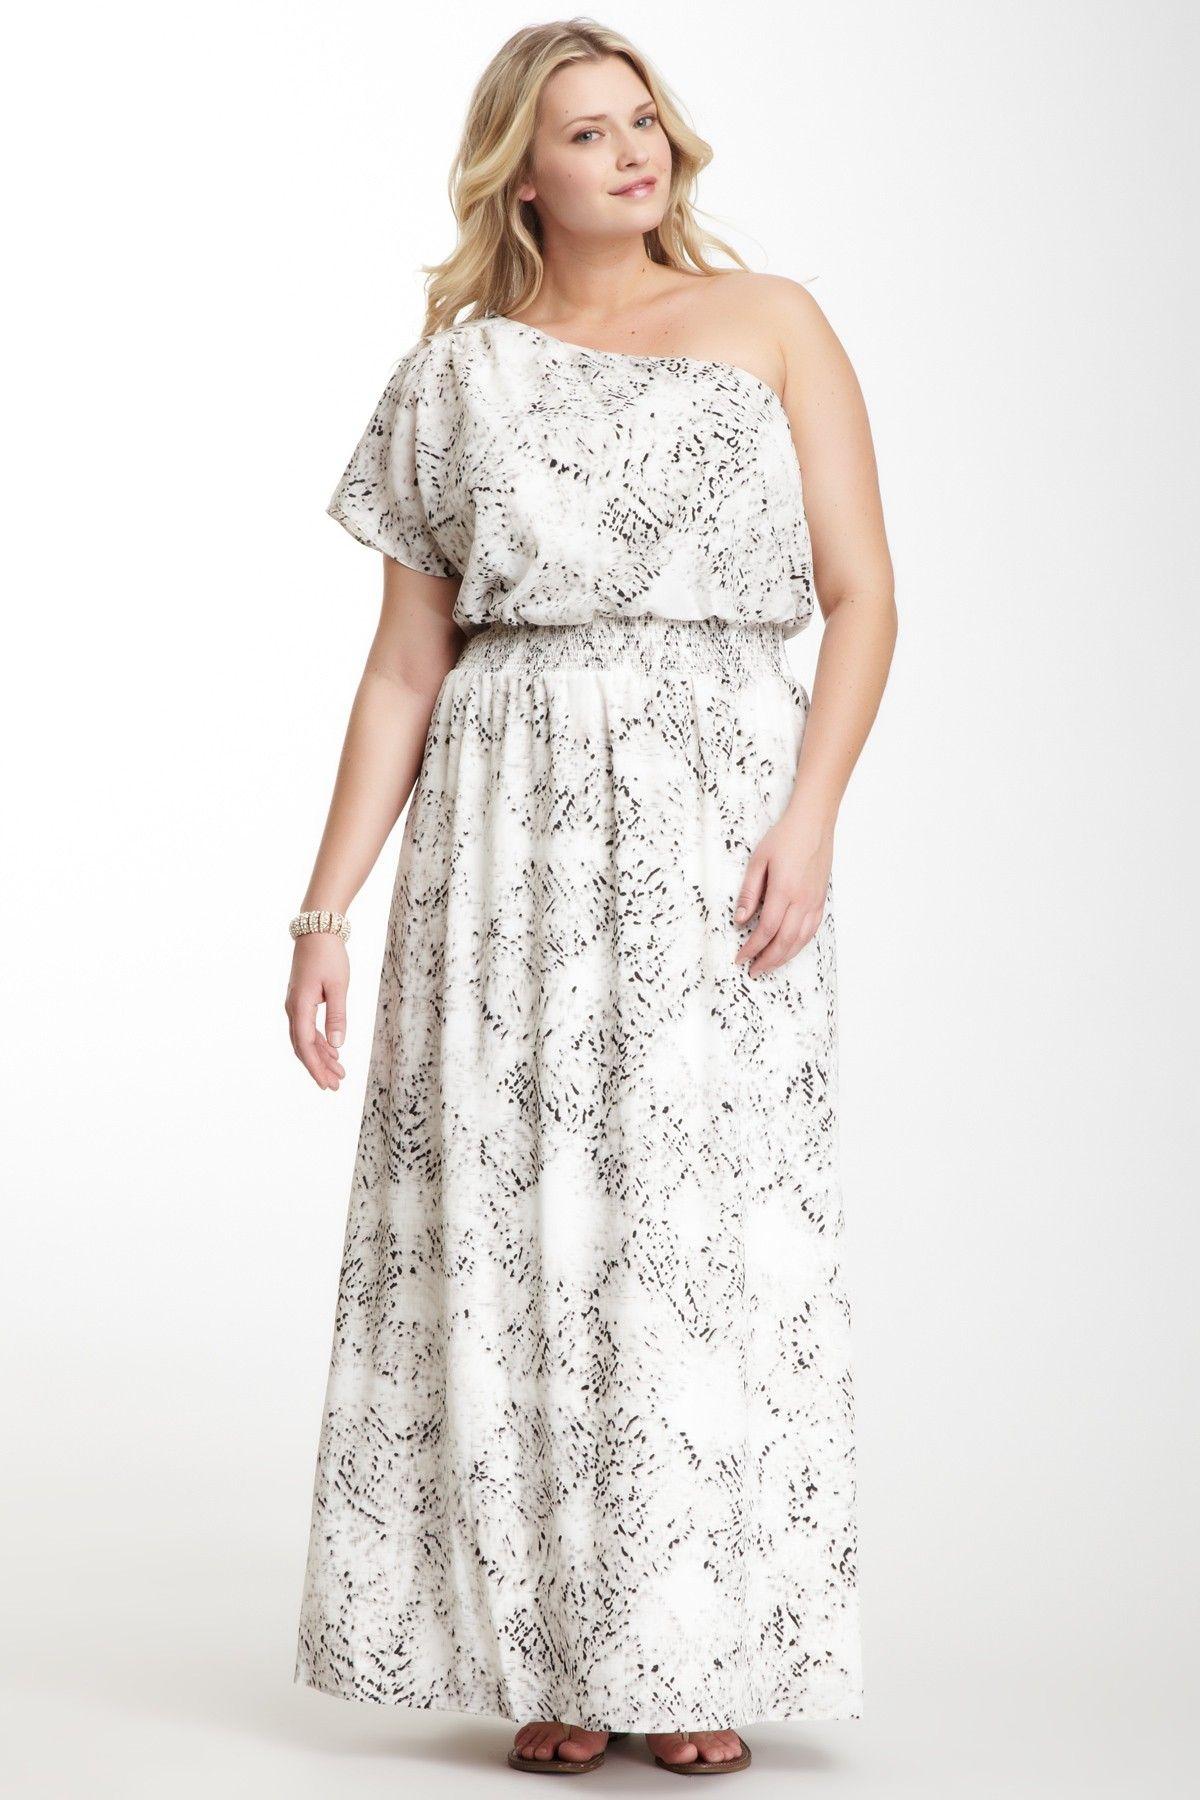 Jessica simpson wedding dress  Smocked Flutter Sleeve Maxi Dress  Curvy Plus size inspiration